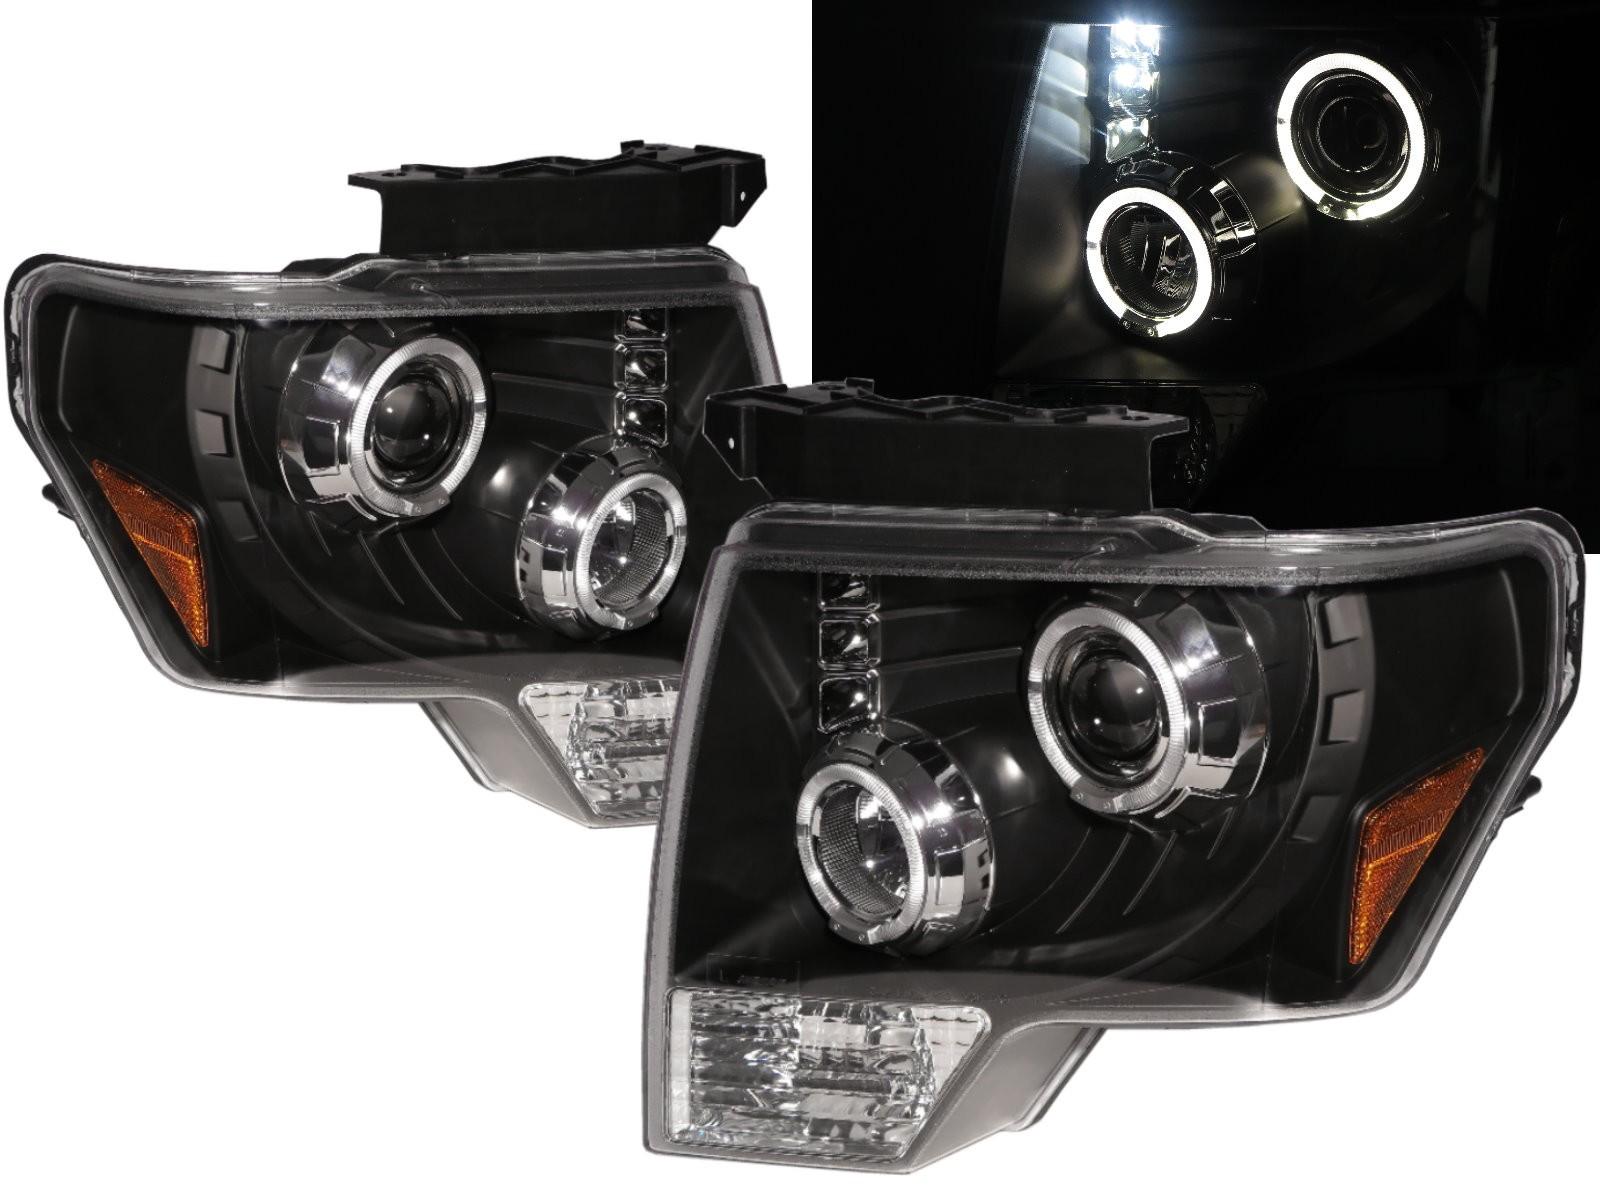 CrazyTheGod F-Series F150 Twelfth generation 2009-2014 Pickup 2D/4D Angel-Eye Projector Headlight Headlamp Black for FORD LHD